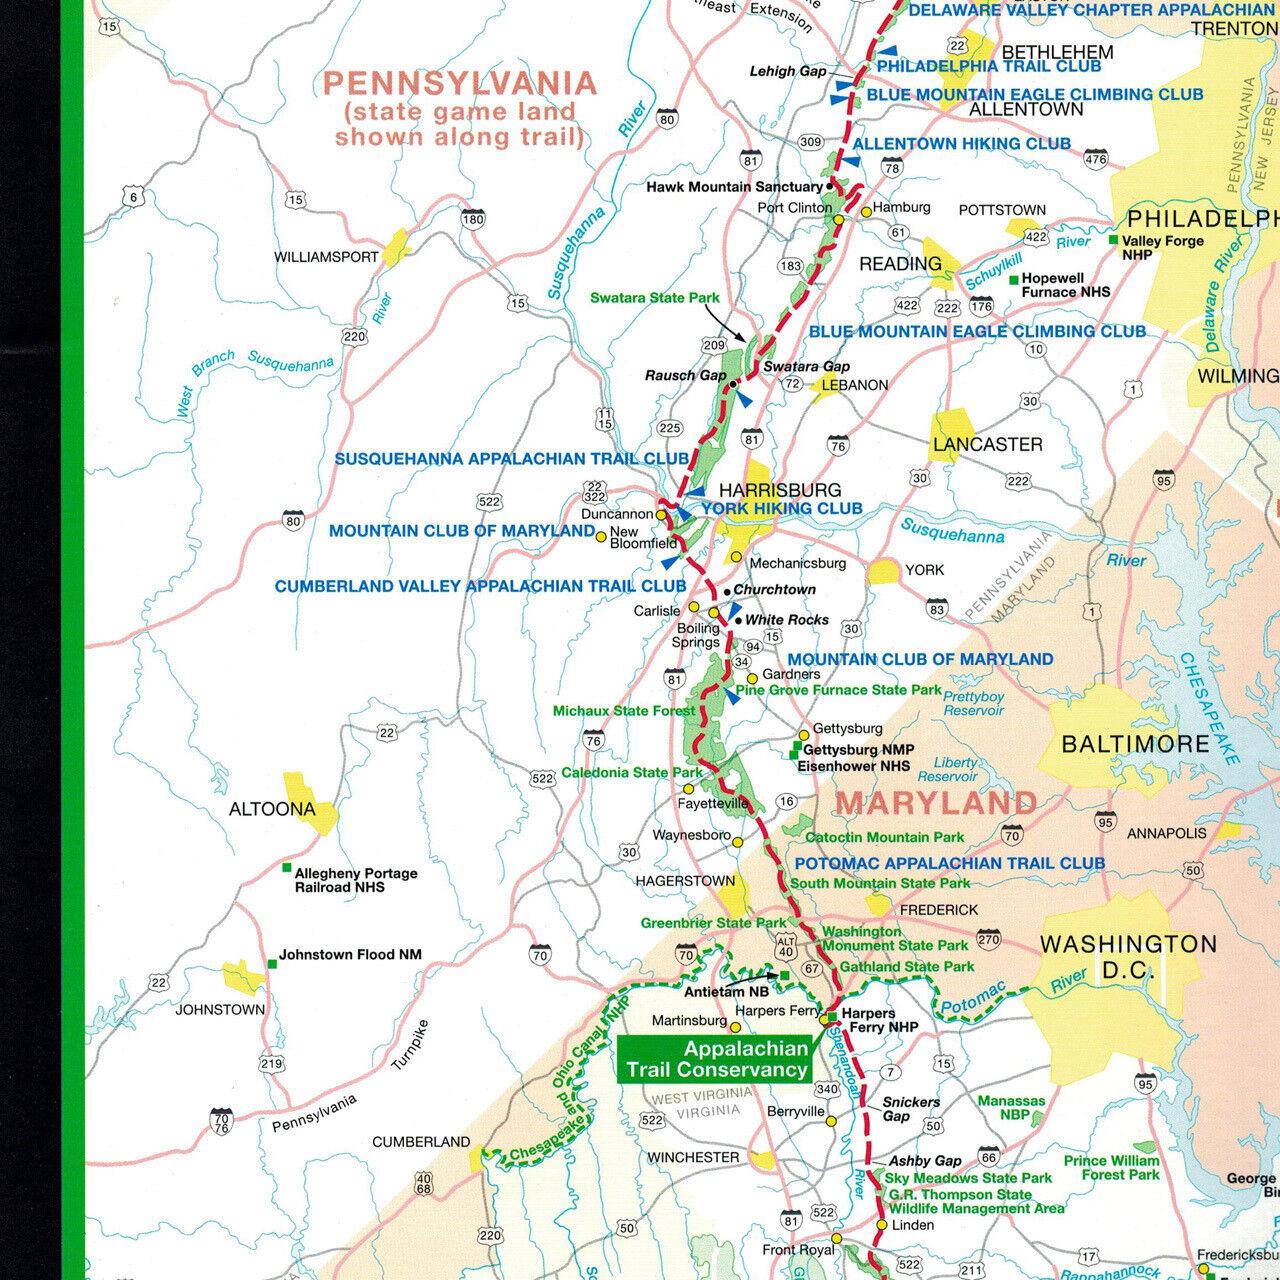 Appalachian Trail Conservancy 9 X 48 Inch Poster Strip Map | eBay